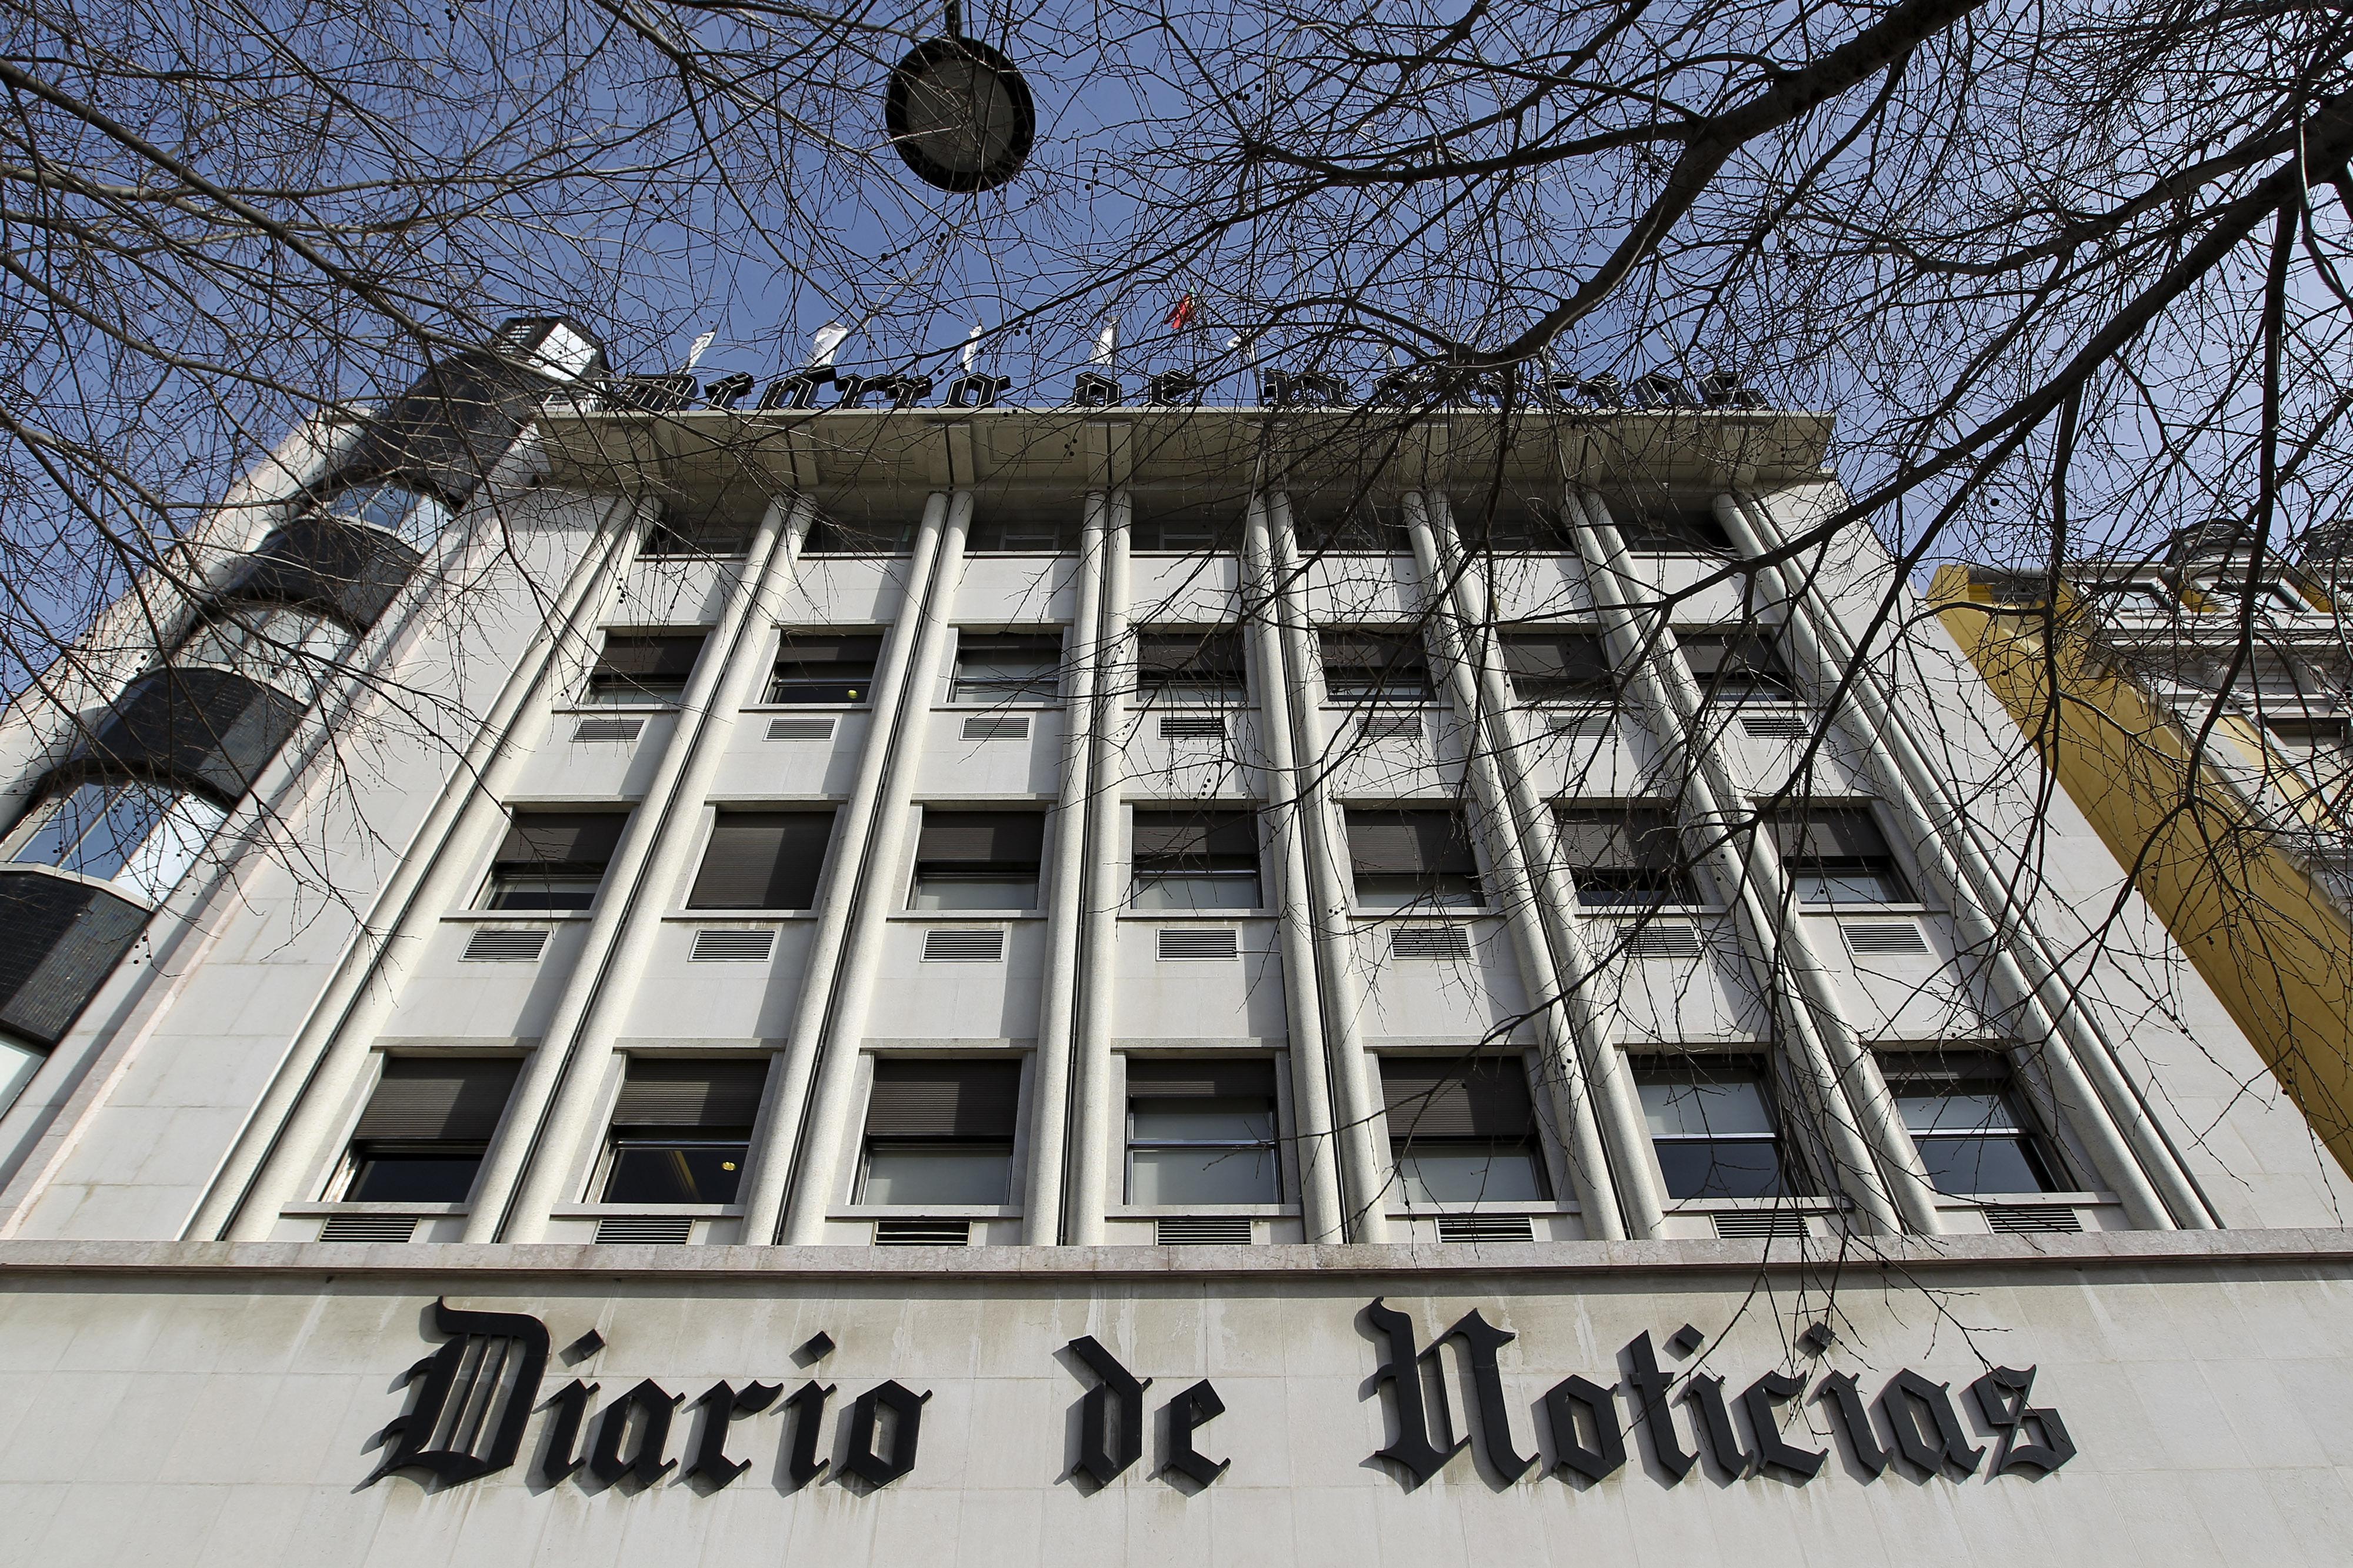 Morreu Luís de Barros, ex-diretor do DN e marido da escritora Maria Teresa Horta